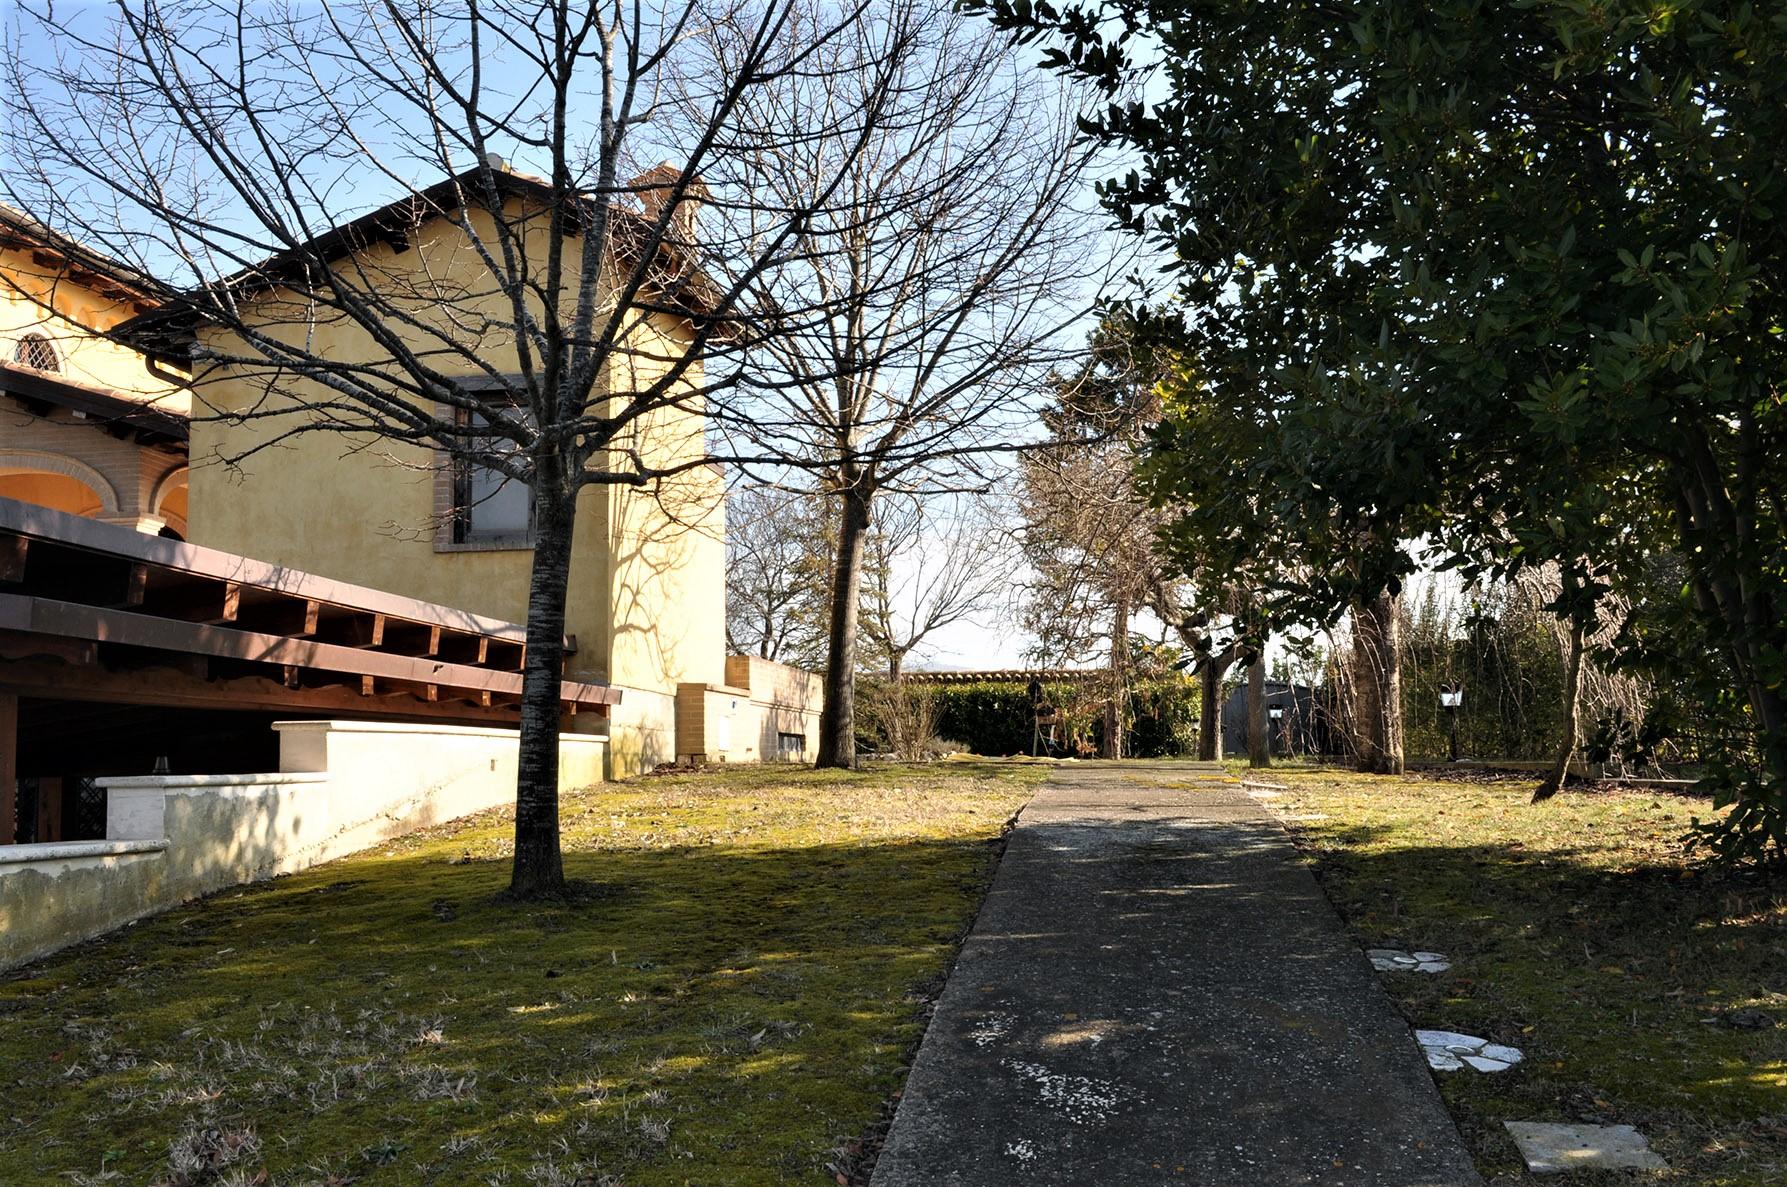 Villa Villa for sale Tortoreto (TE), Villa Bianca - Tortoreto - EUR 770.233 430